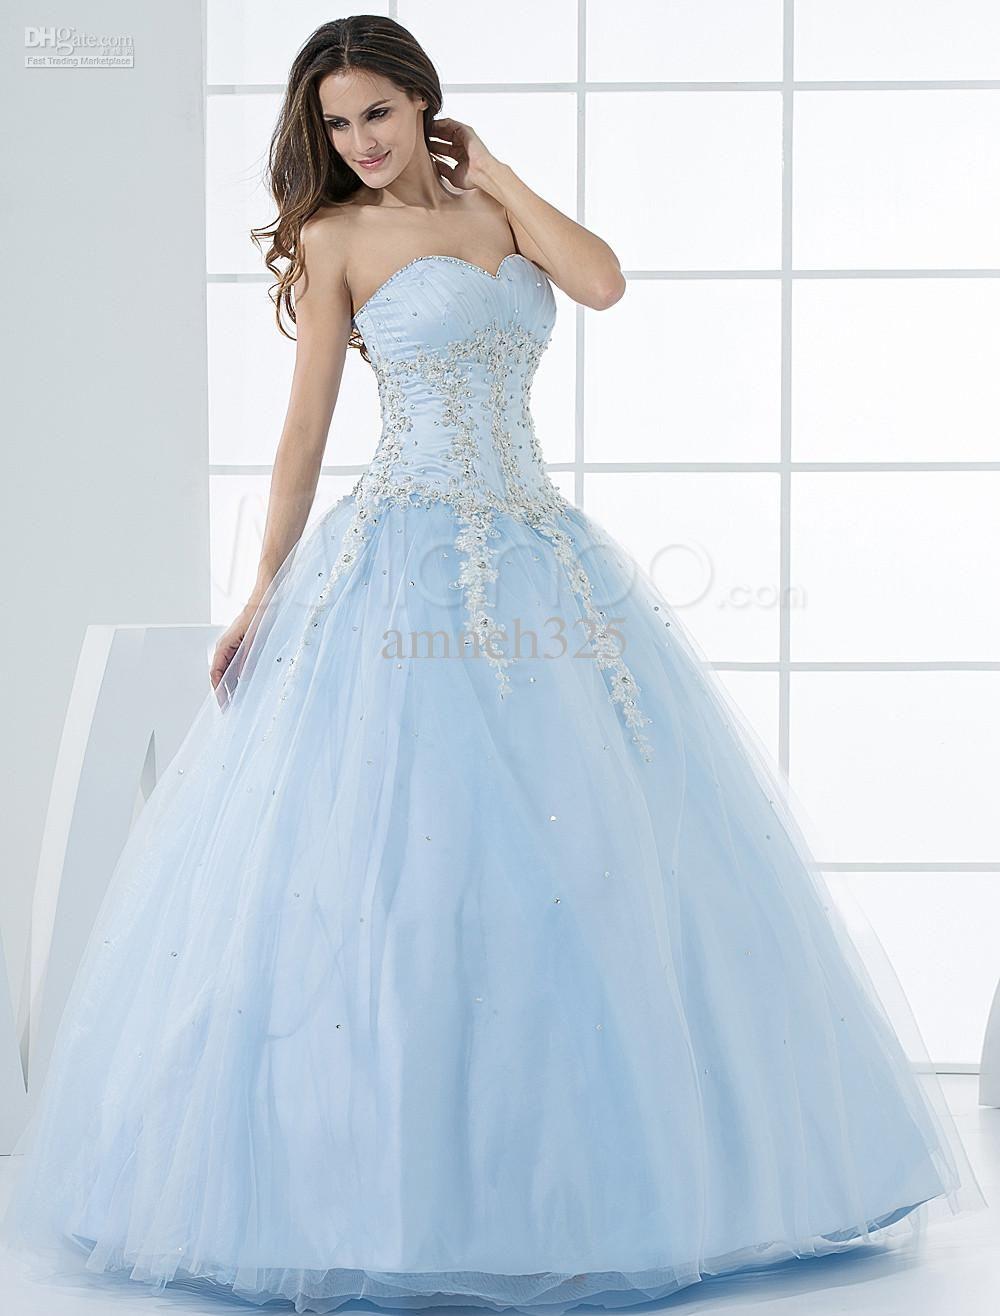 Net Gown | Beautiful dresses | Pinterest | Sweetheart dress, Baby ...